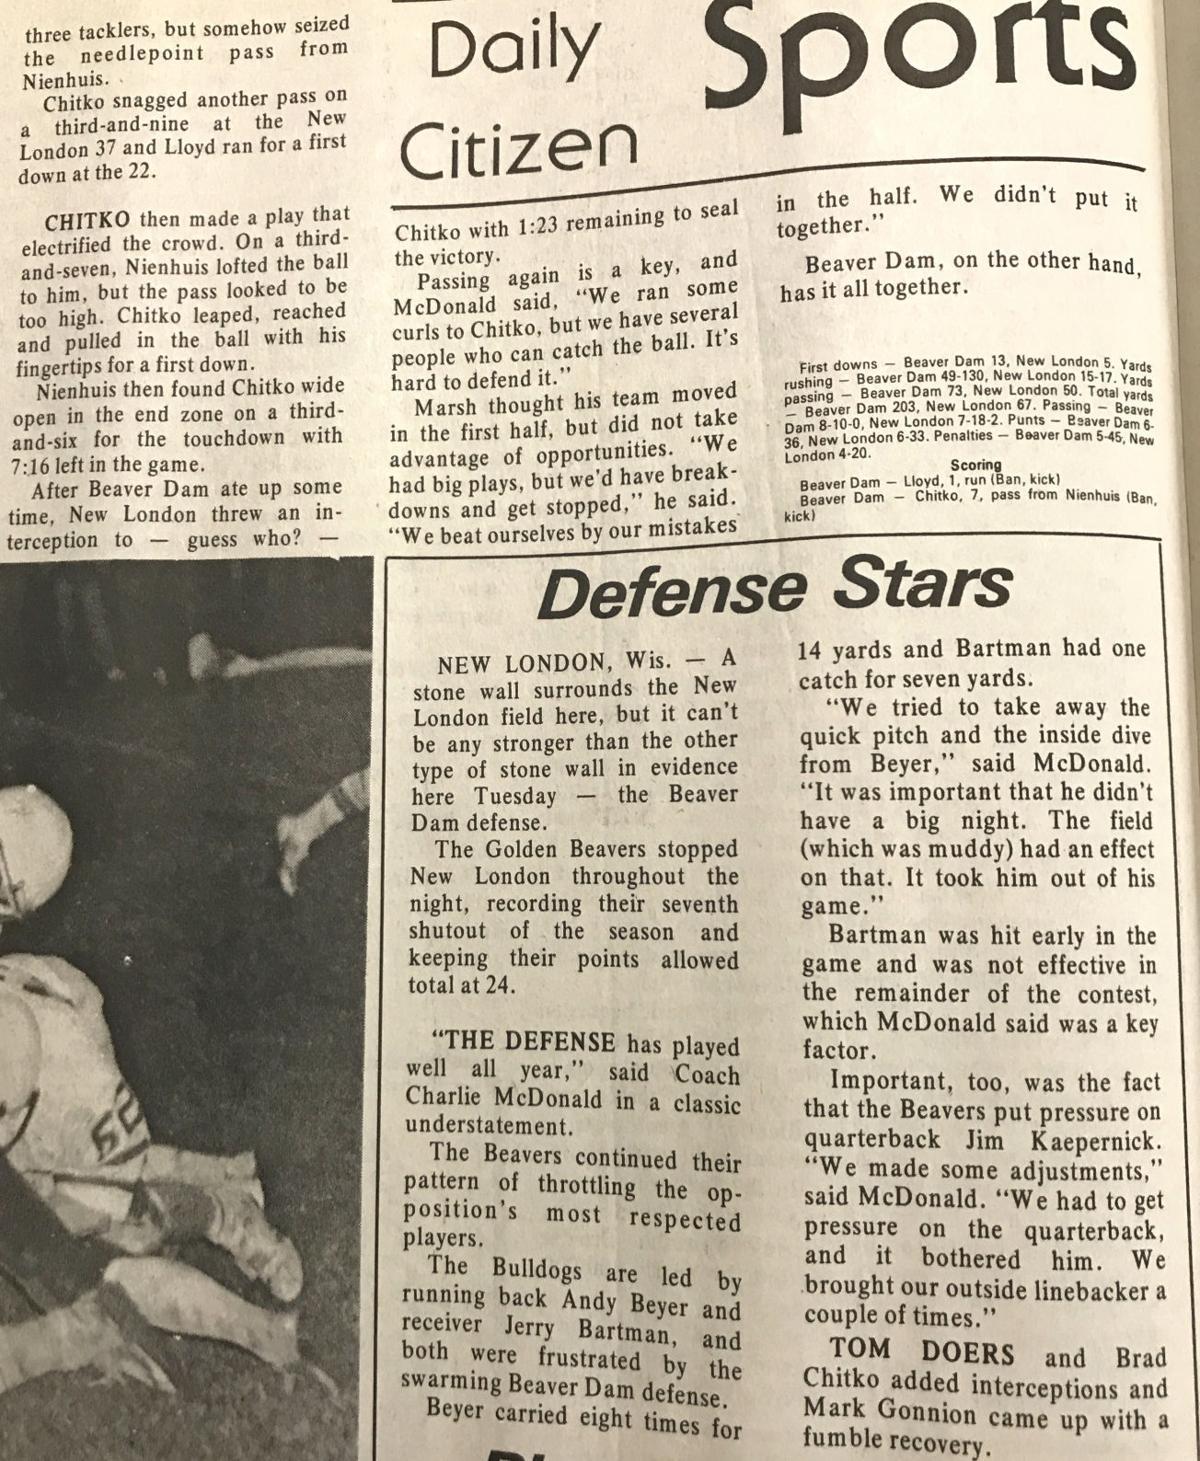 PREP FOOTBALL: BD's 1982 team that made state semis having